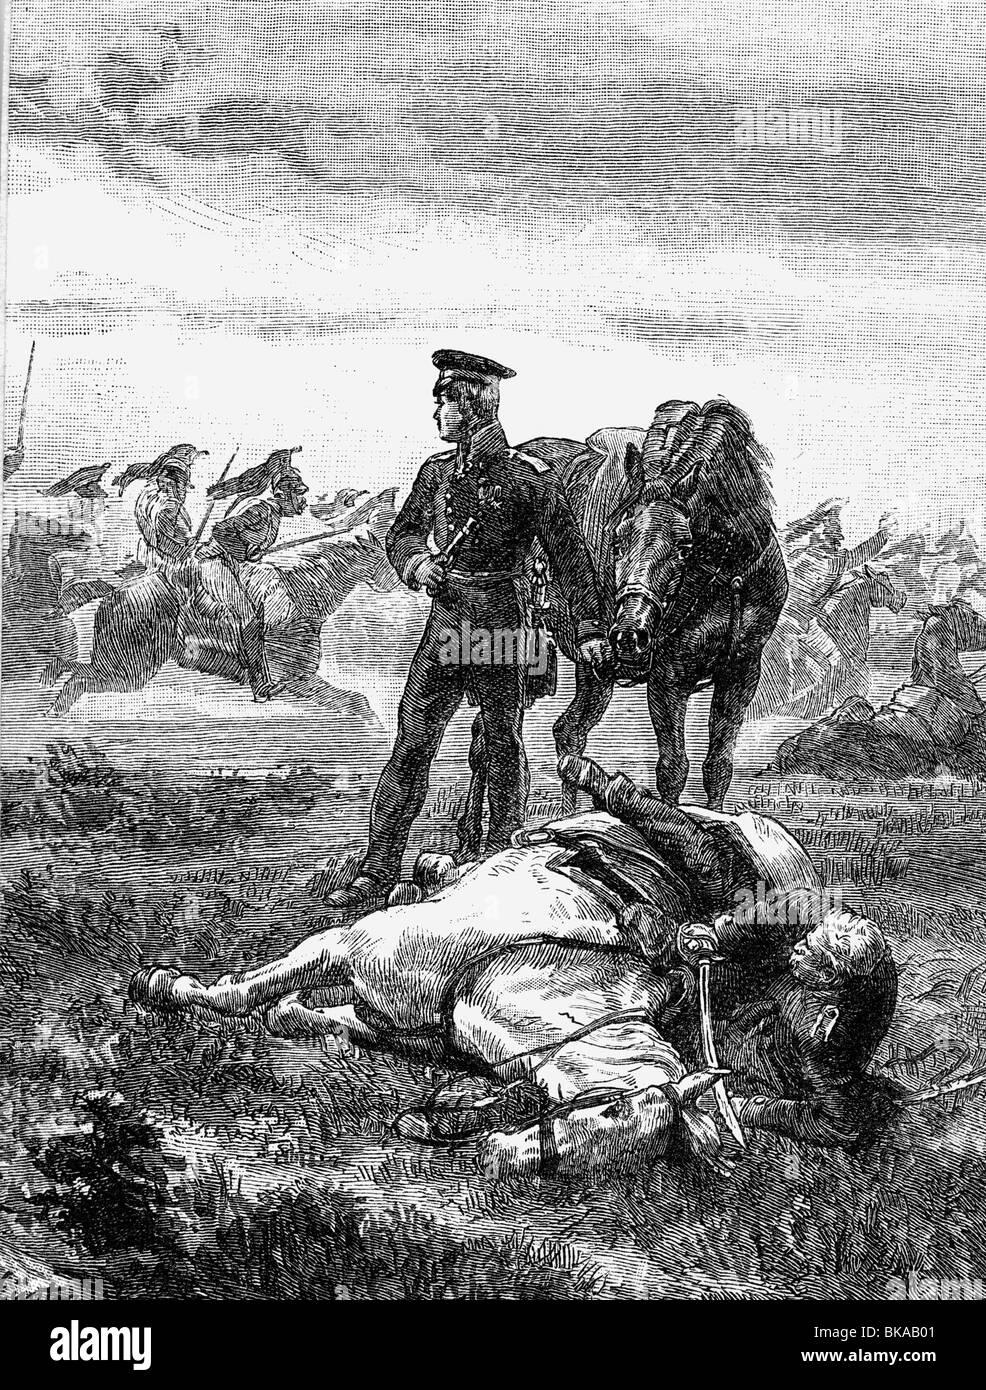 Bluecher, Gebhard Leberecht von, 16. 12.1742 - 12.9.1819, Prussian general, in the Battle of Ligny, 16.6.1815, is - Stock Image